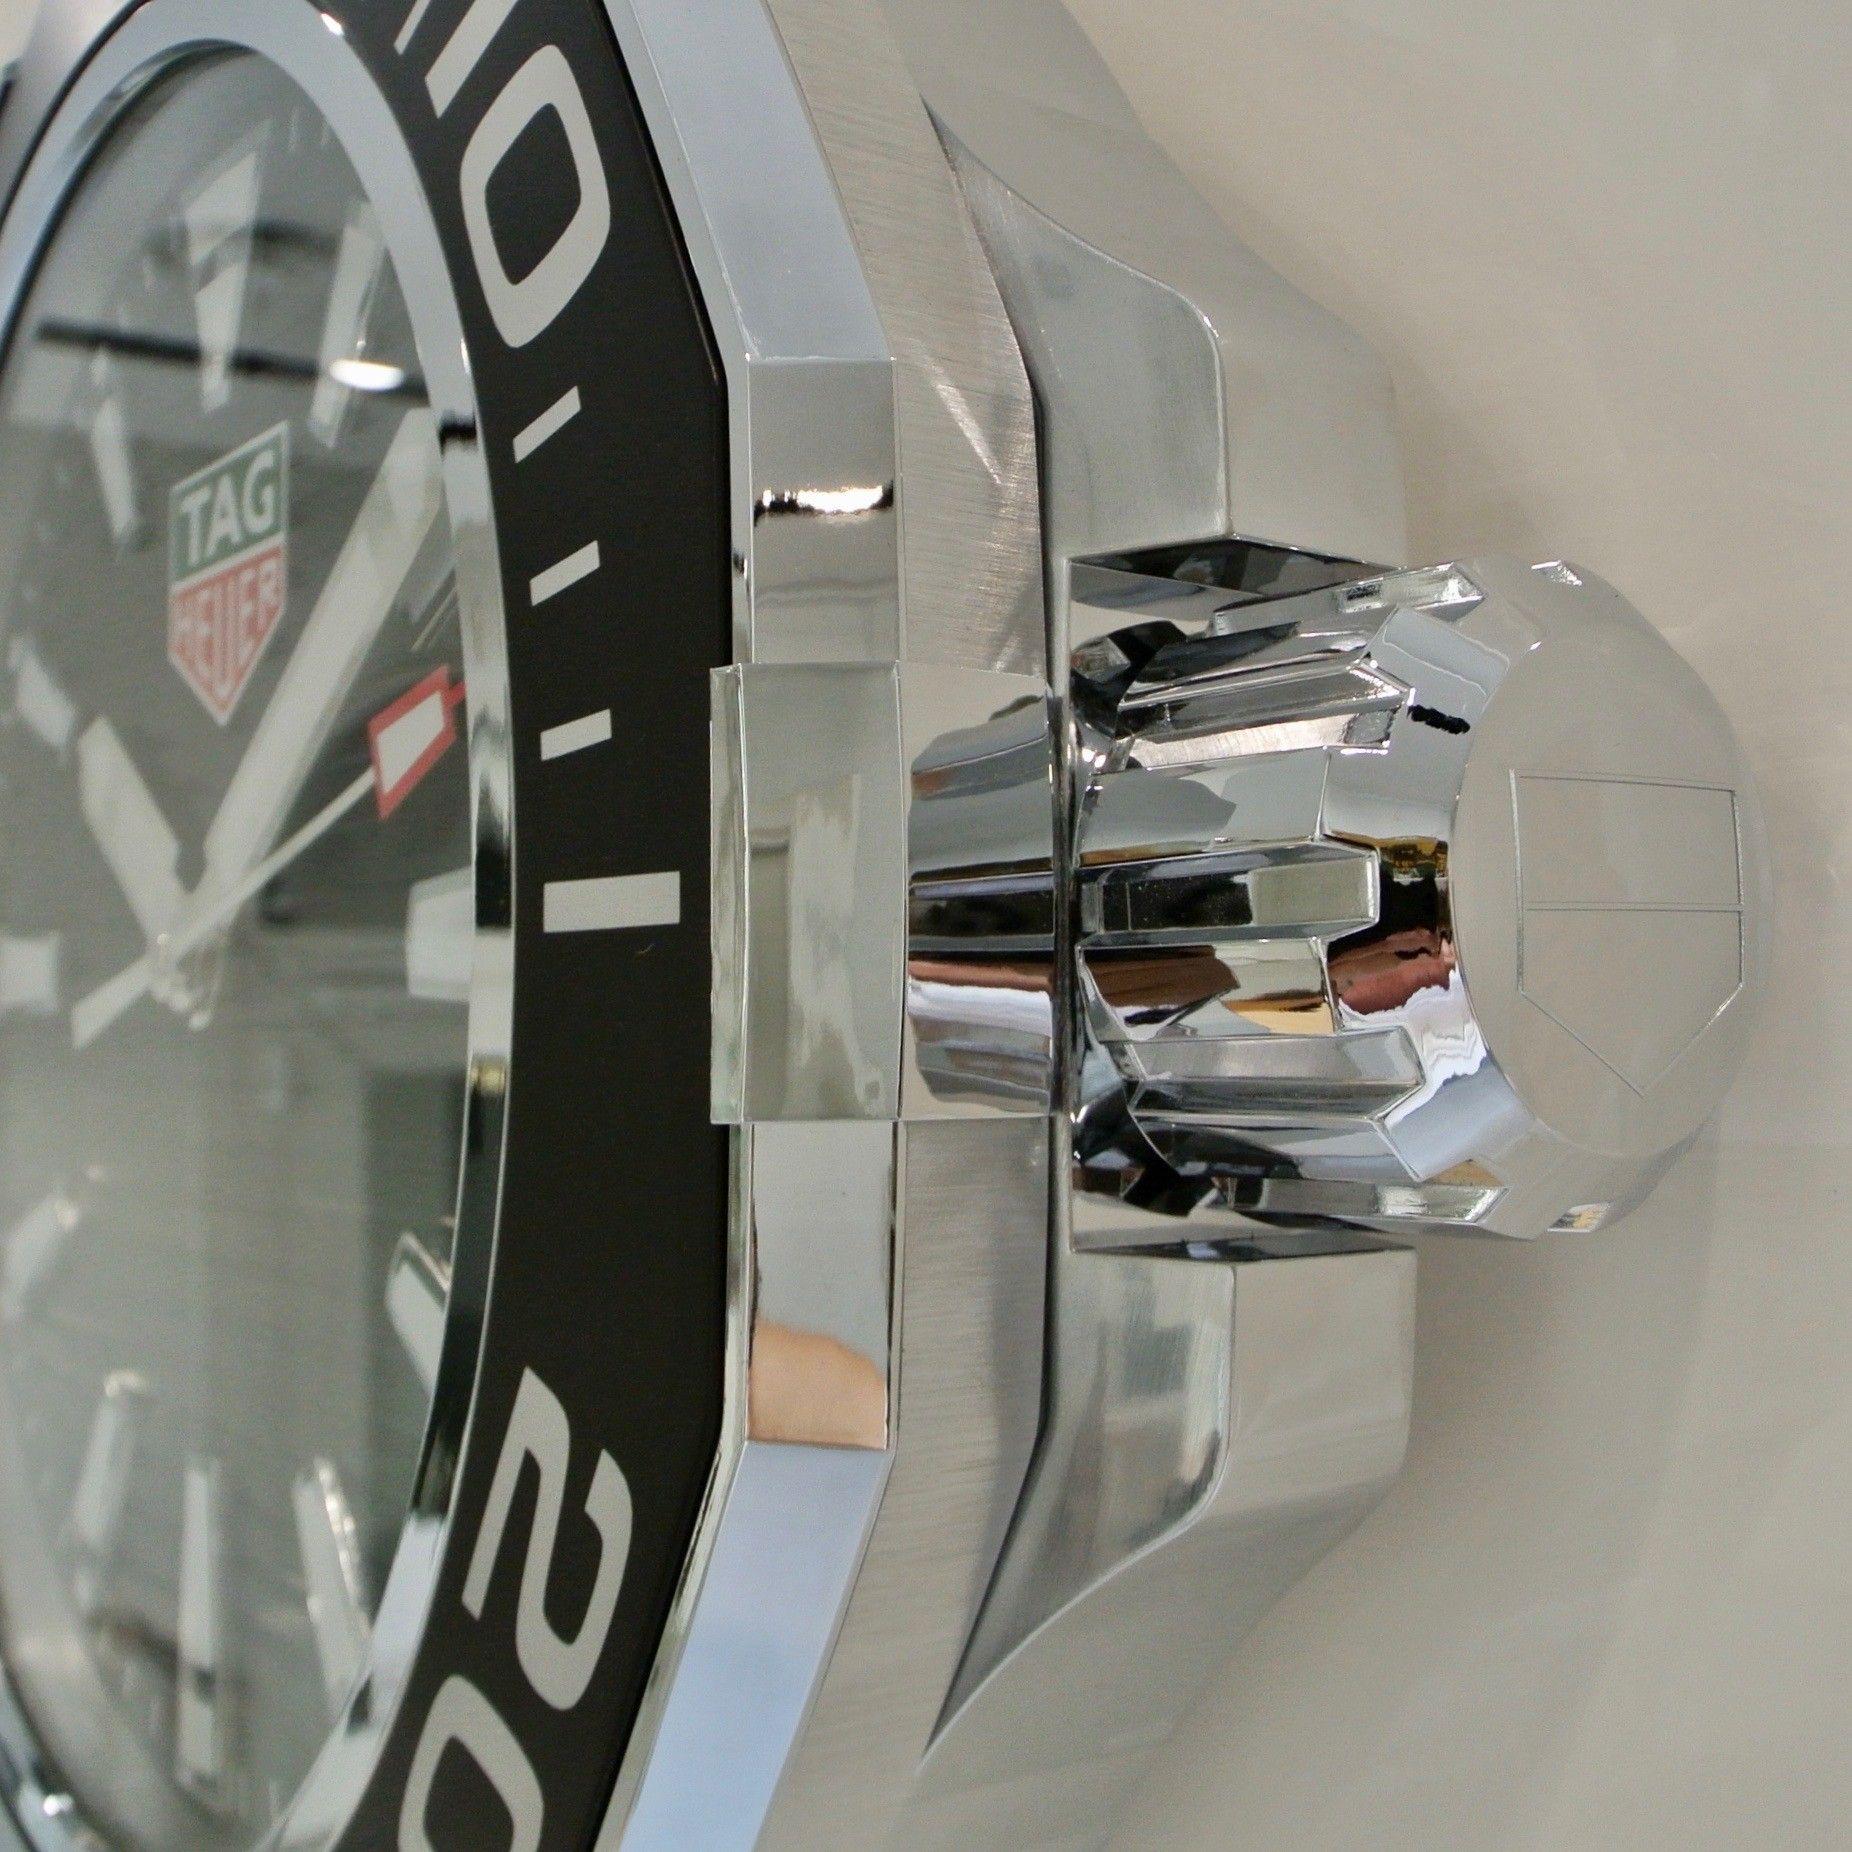 TAG HEUER WALL CLOCK ORIGINAL